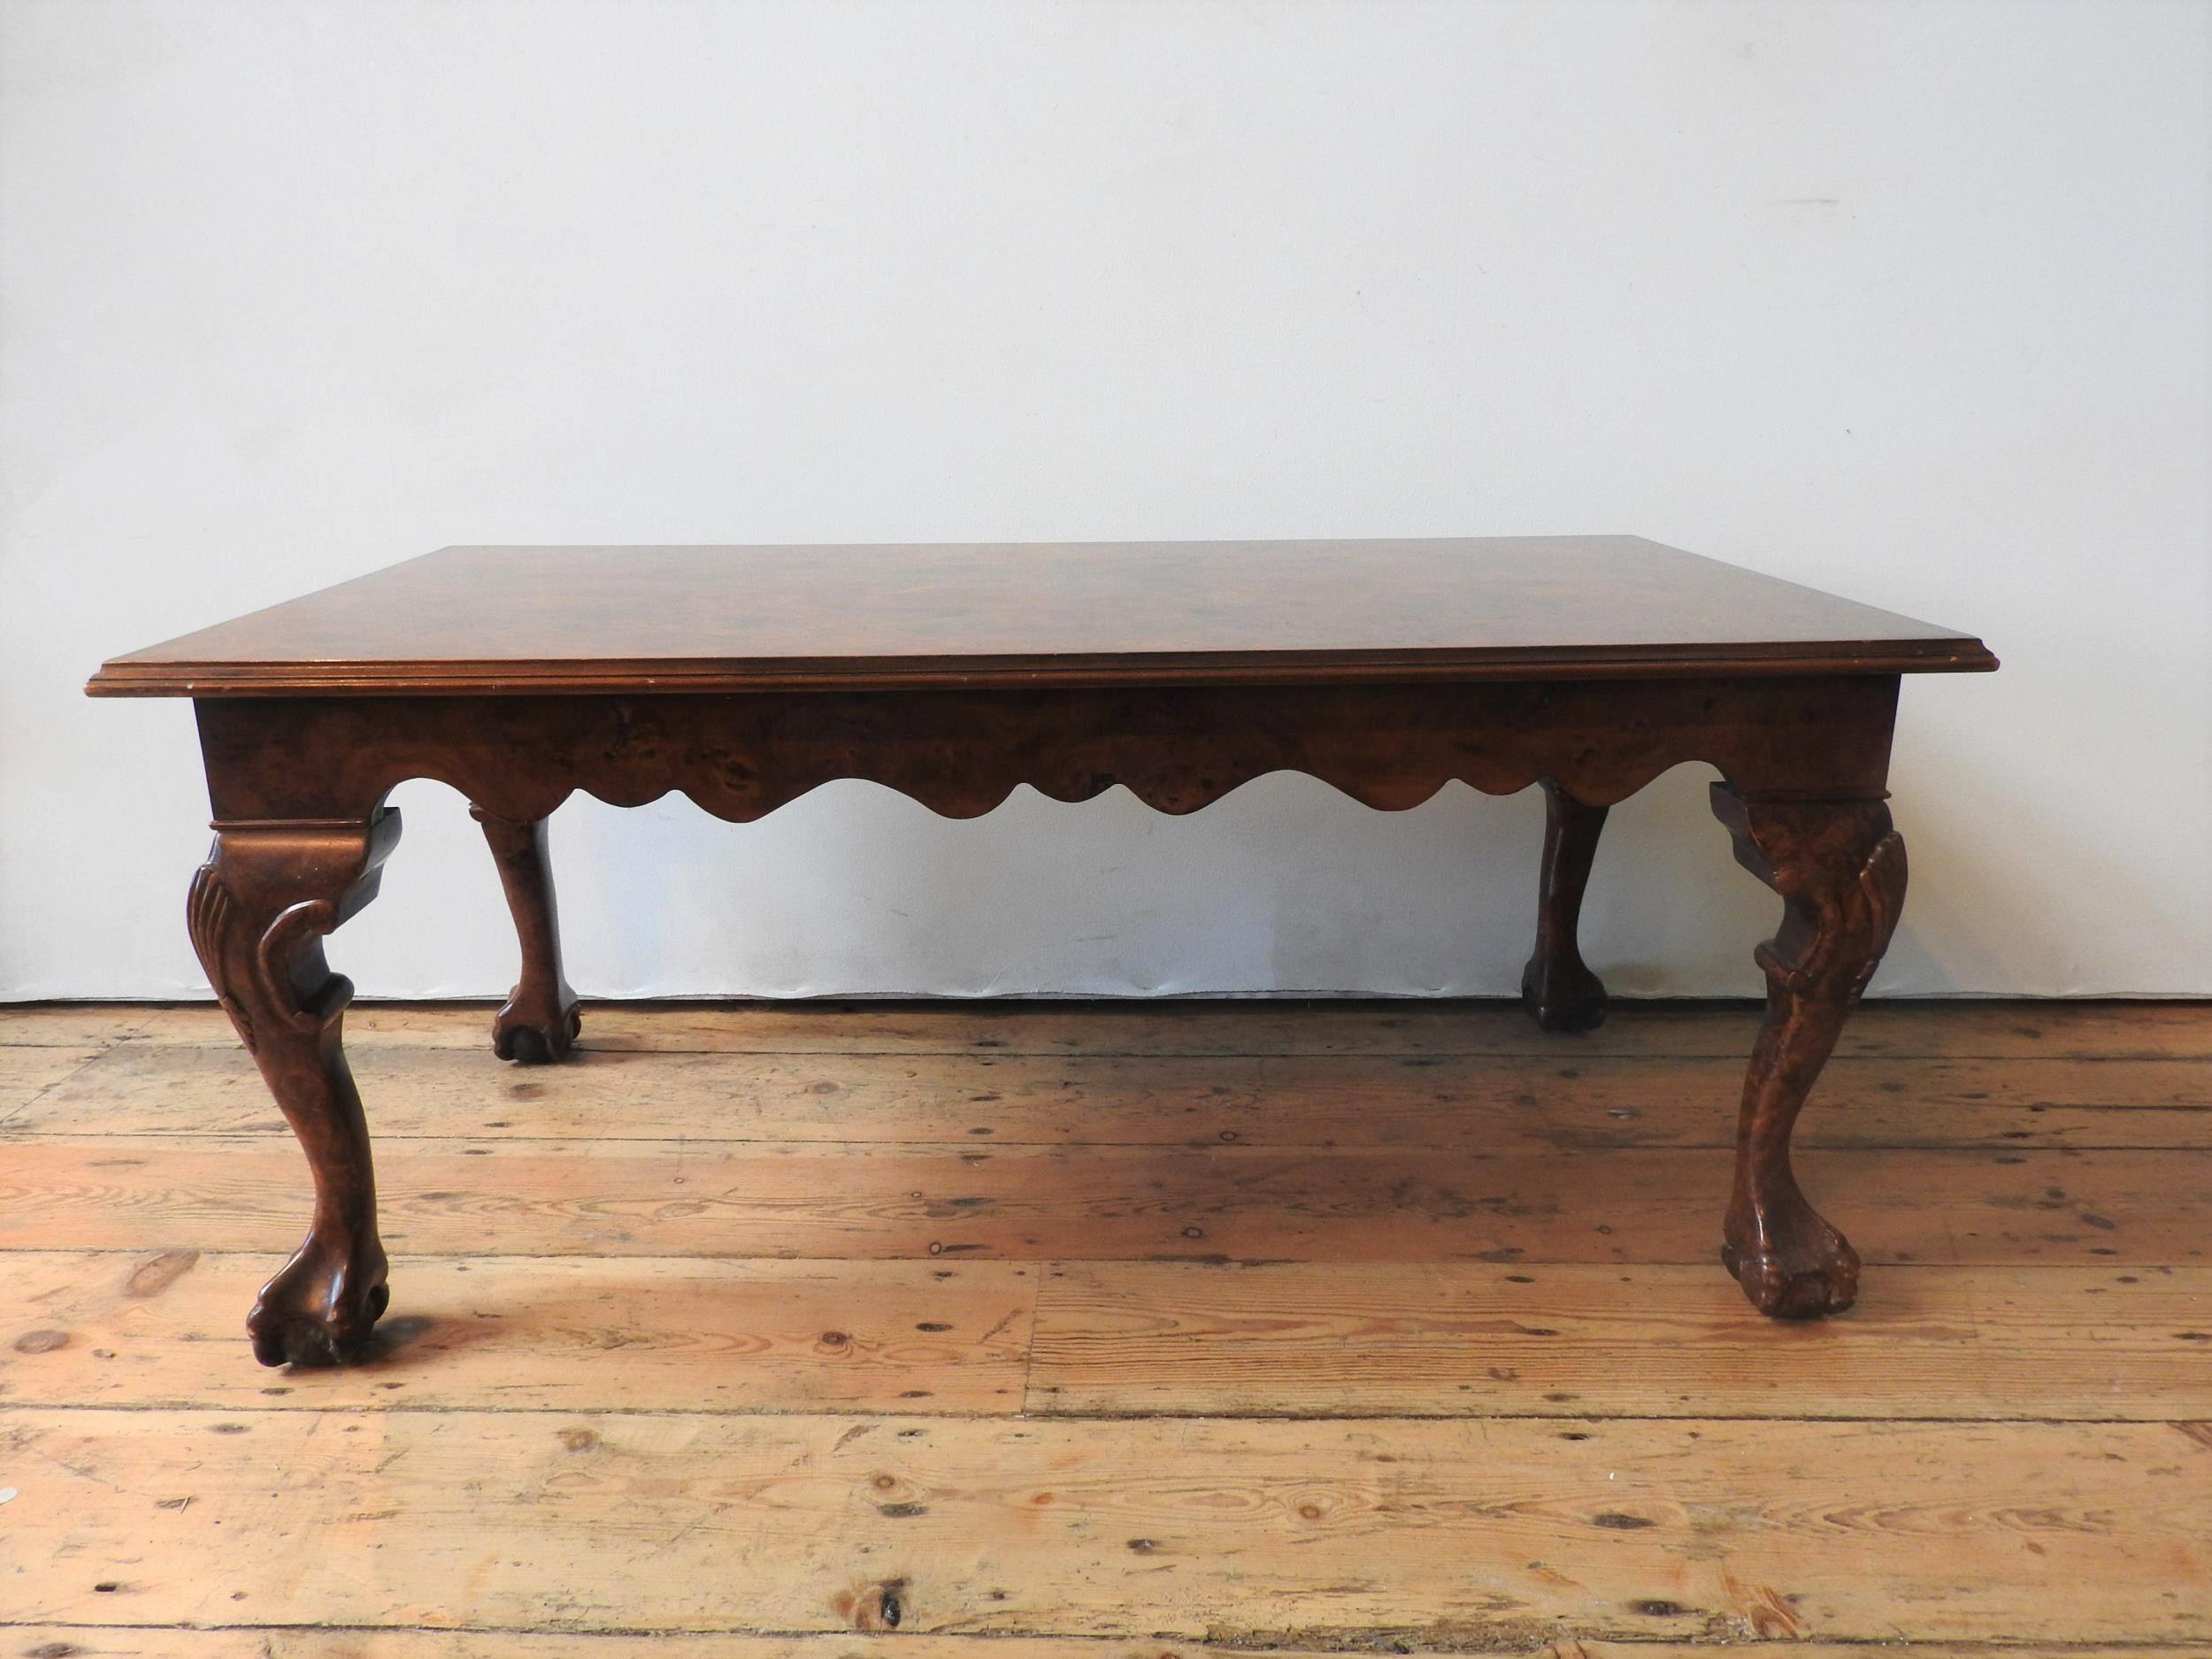 A 20TH CENTURY CLAW FOOT BURR WALNUT EFFECT COFFEE TABLE, 47 x 56 x 107 cm - Image 2 of 2